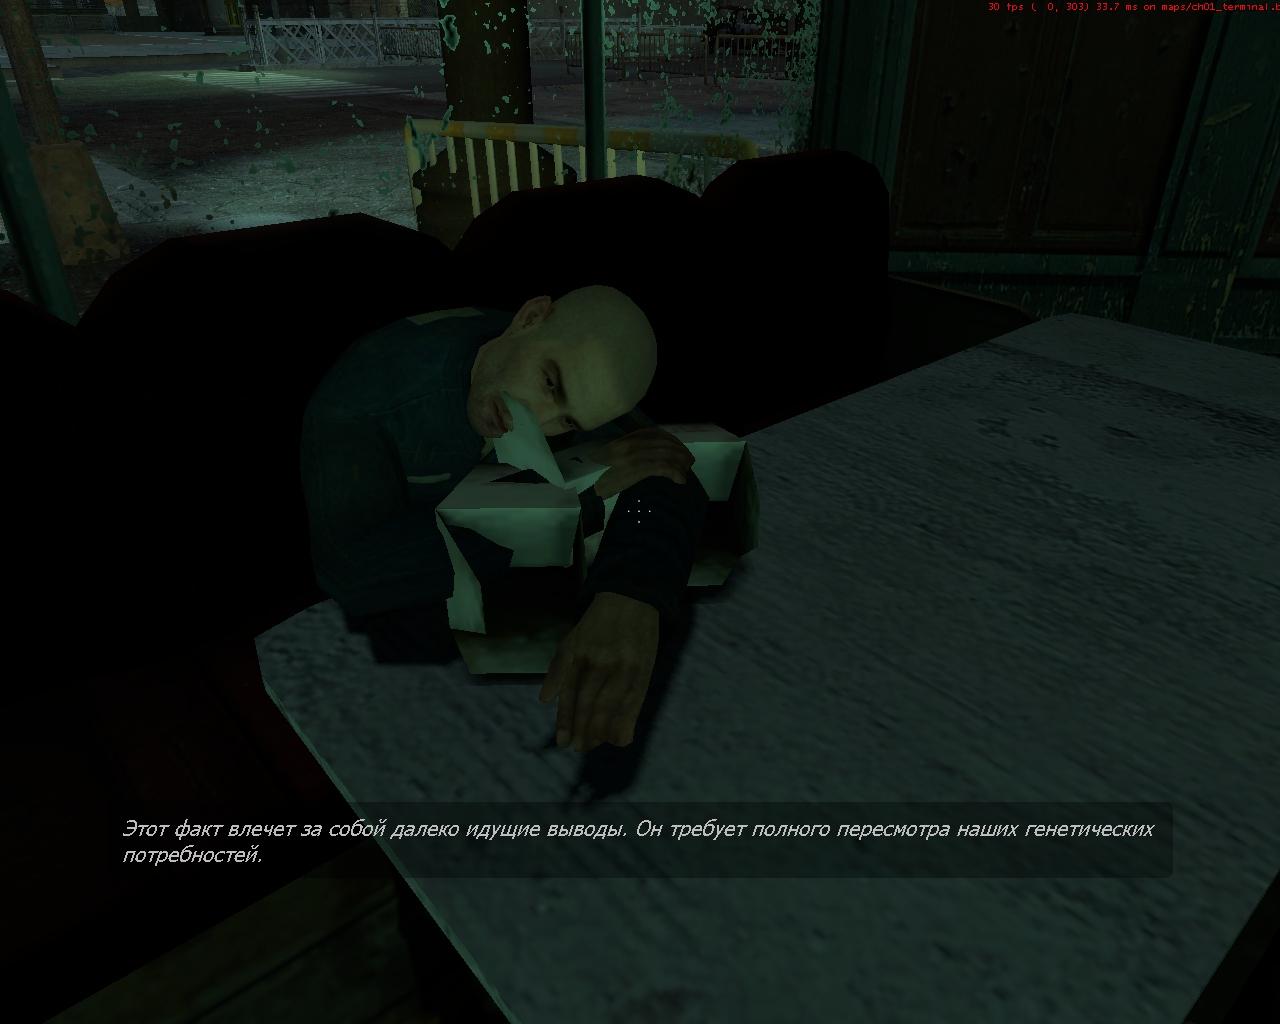 ch01_terminal0215.jpg - Half-Life 2 ch01_terminal, Dark Interval, Dark Interval: Part 1